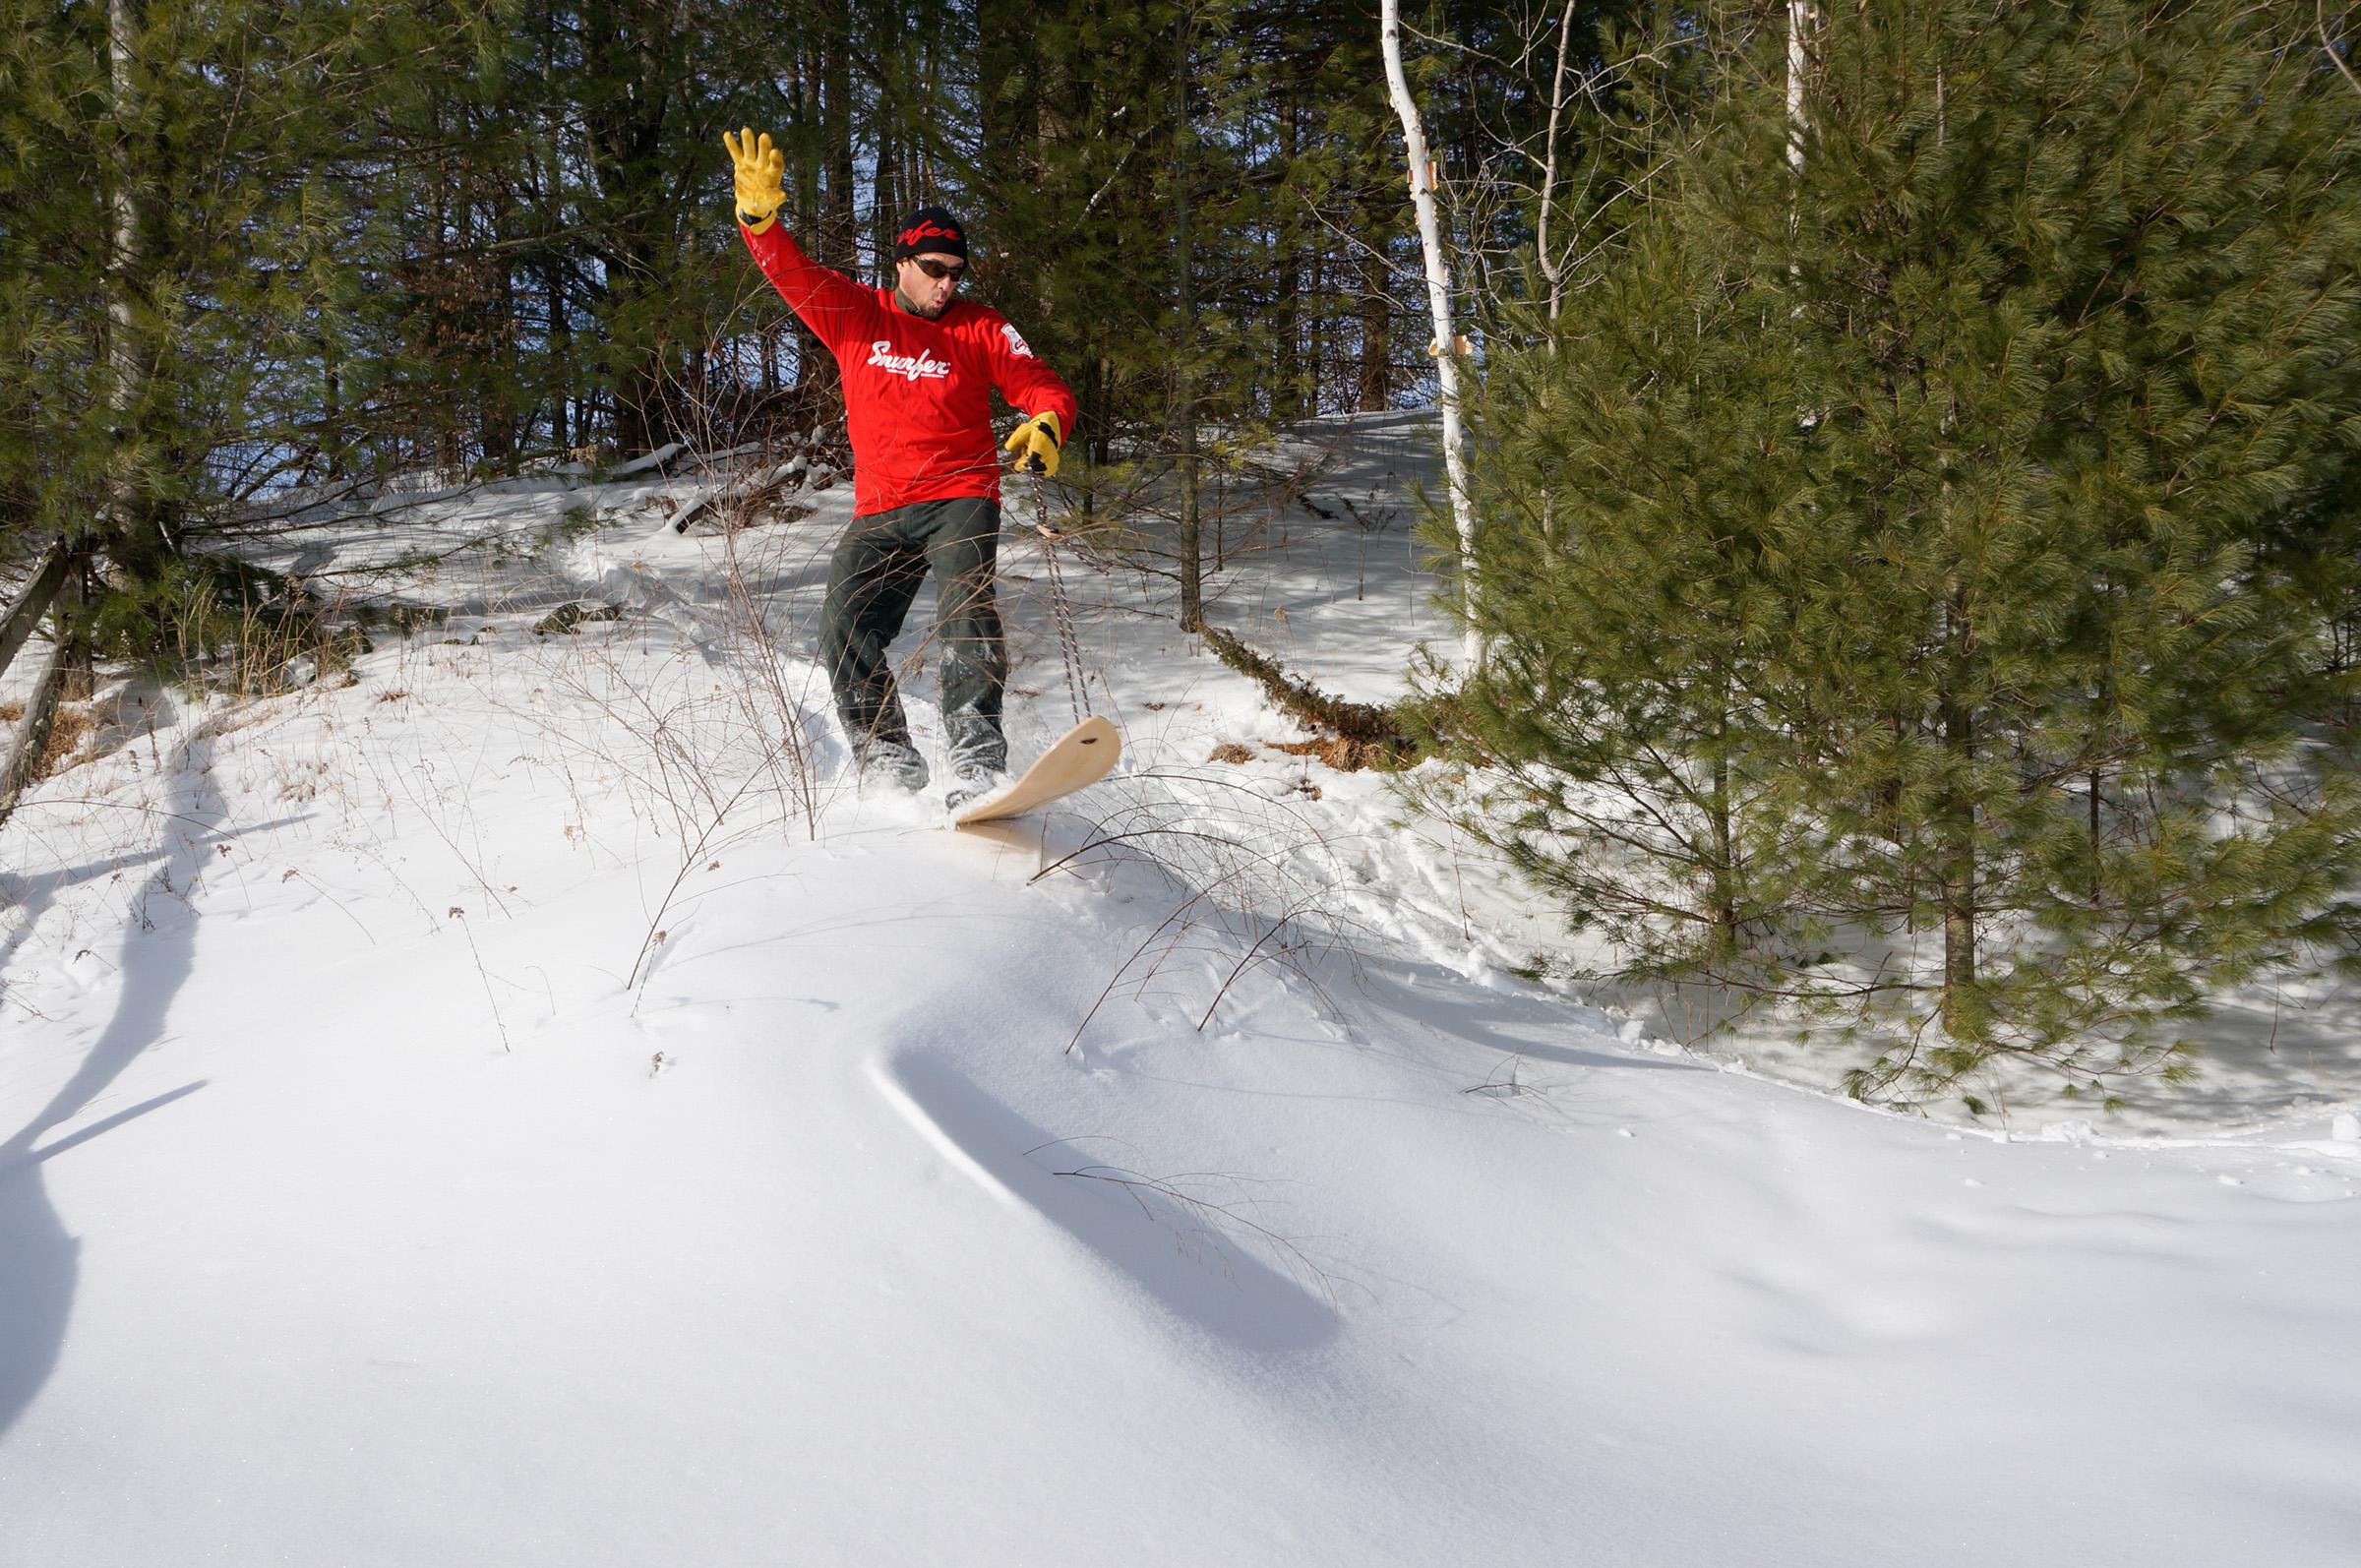 snurfer boards the original snow surfer offers everyone more fun